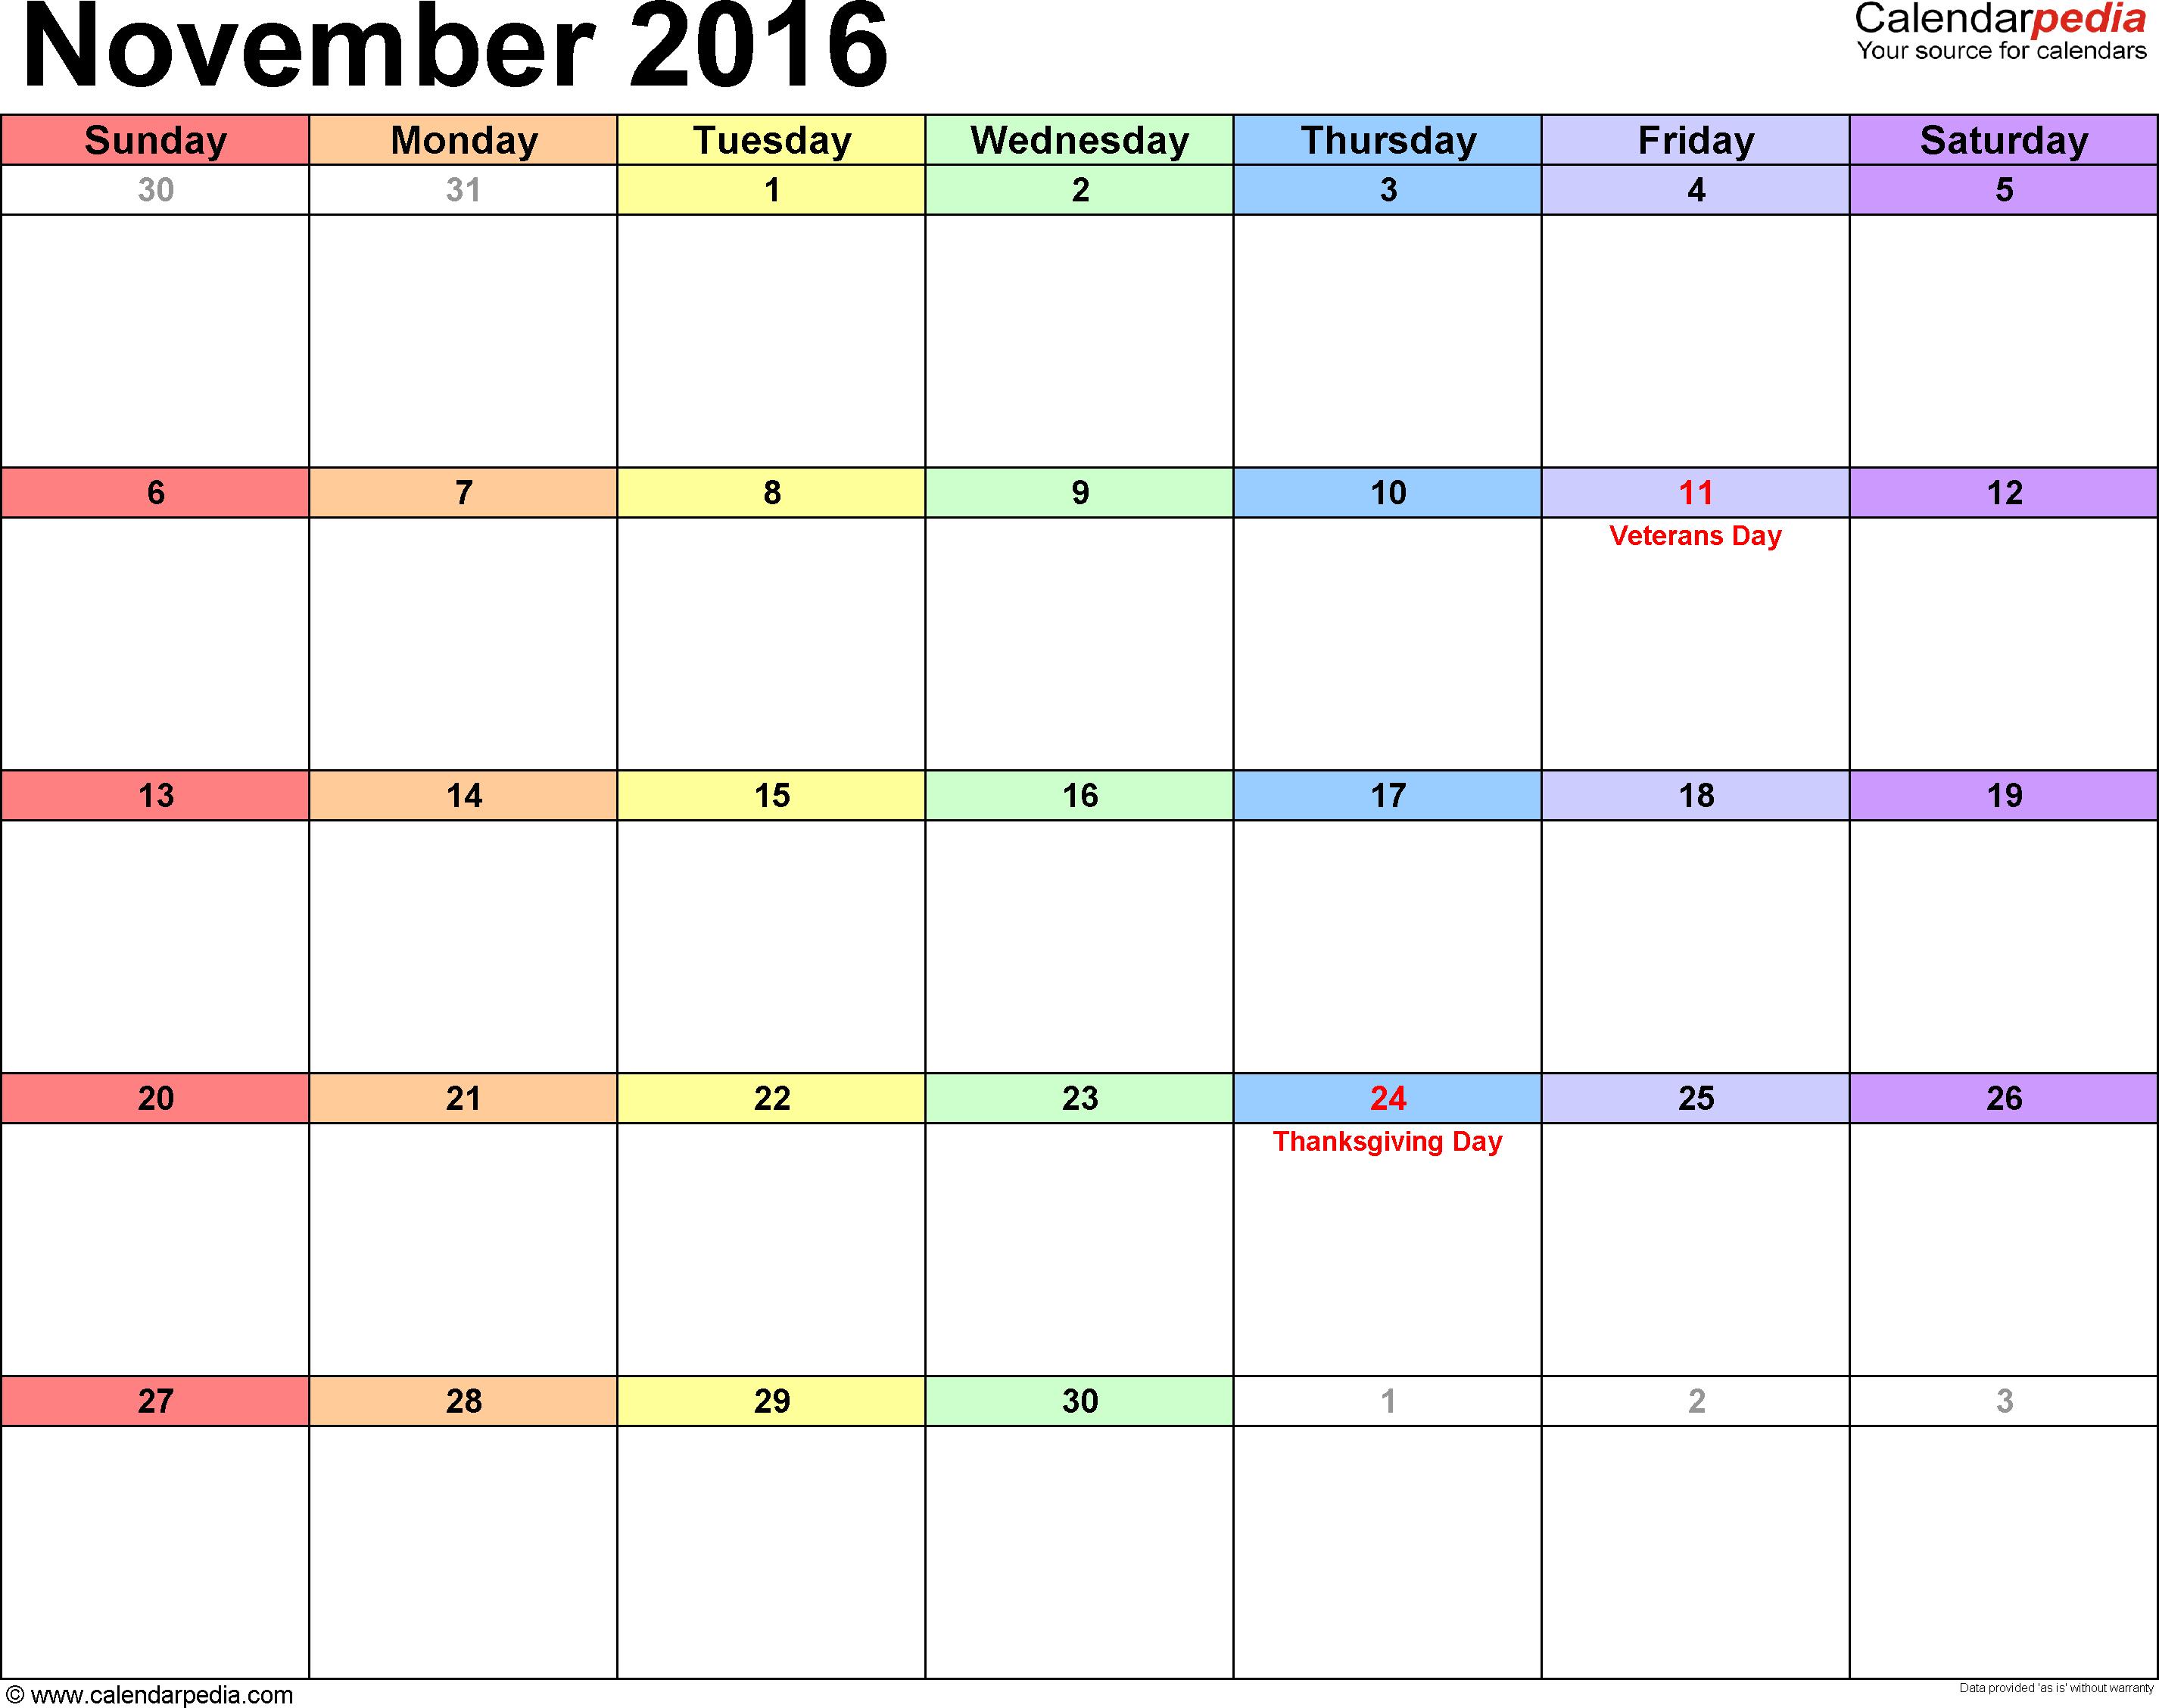 November 2016 calendar printable template